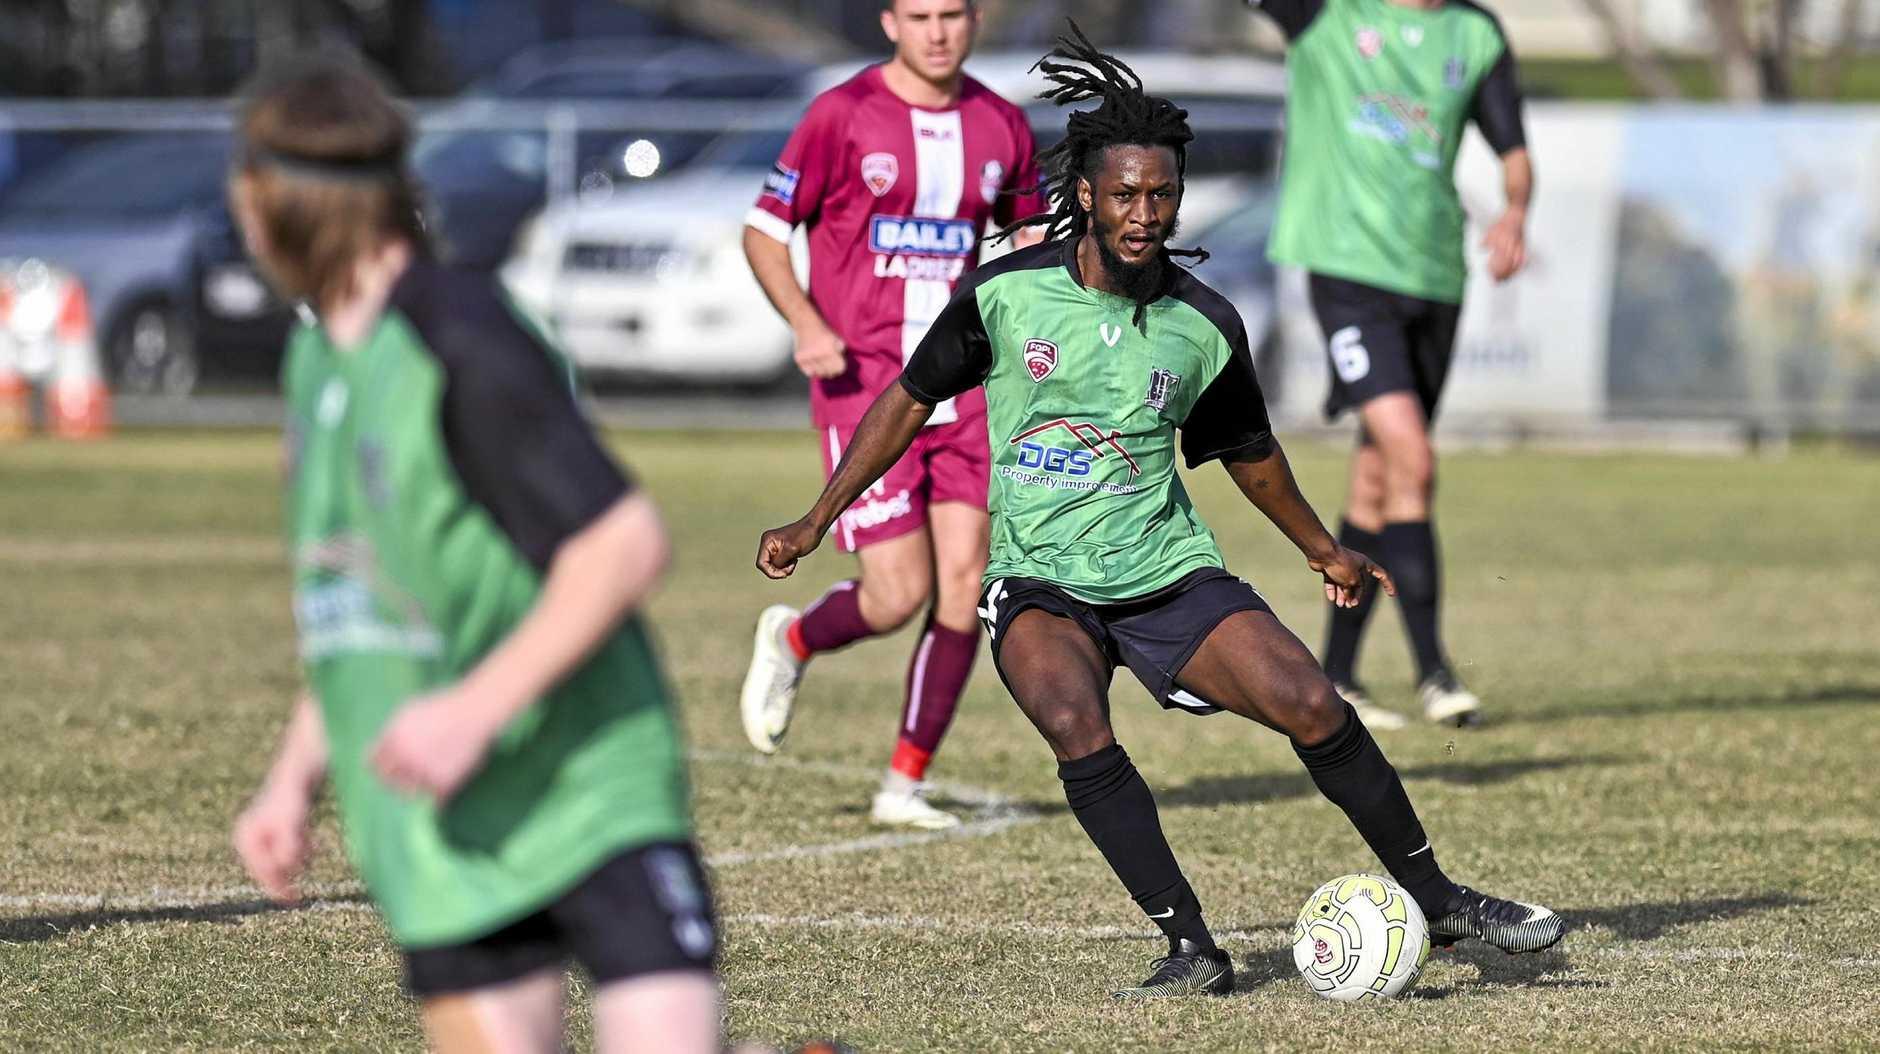 Ipswich Knights attacking midfielder Emmanuel Peter.